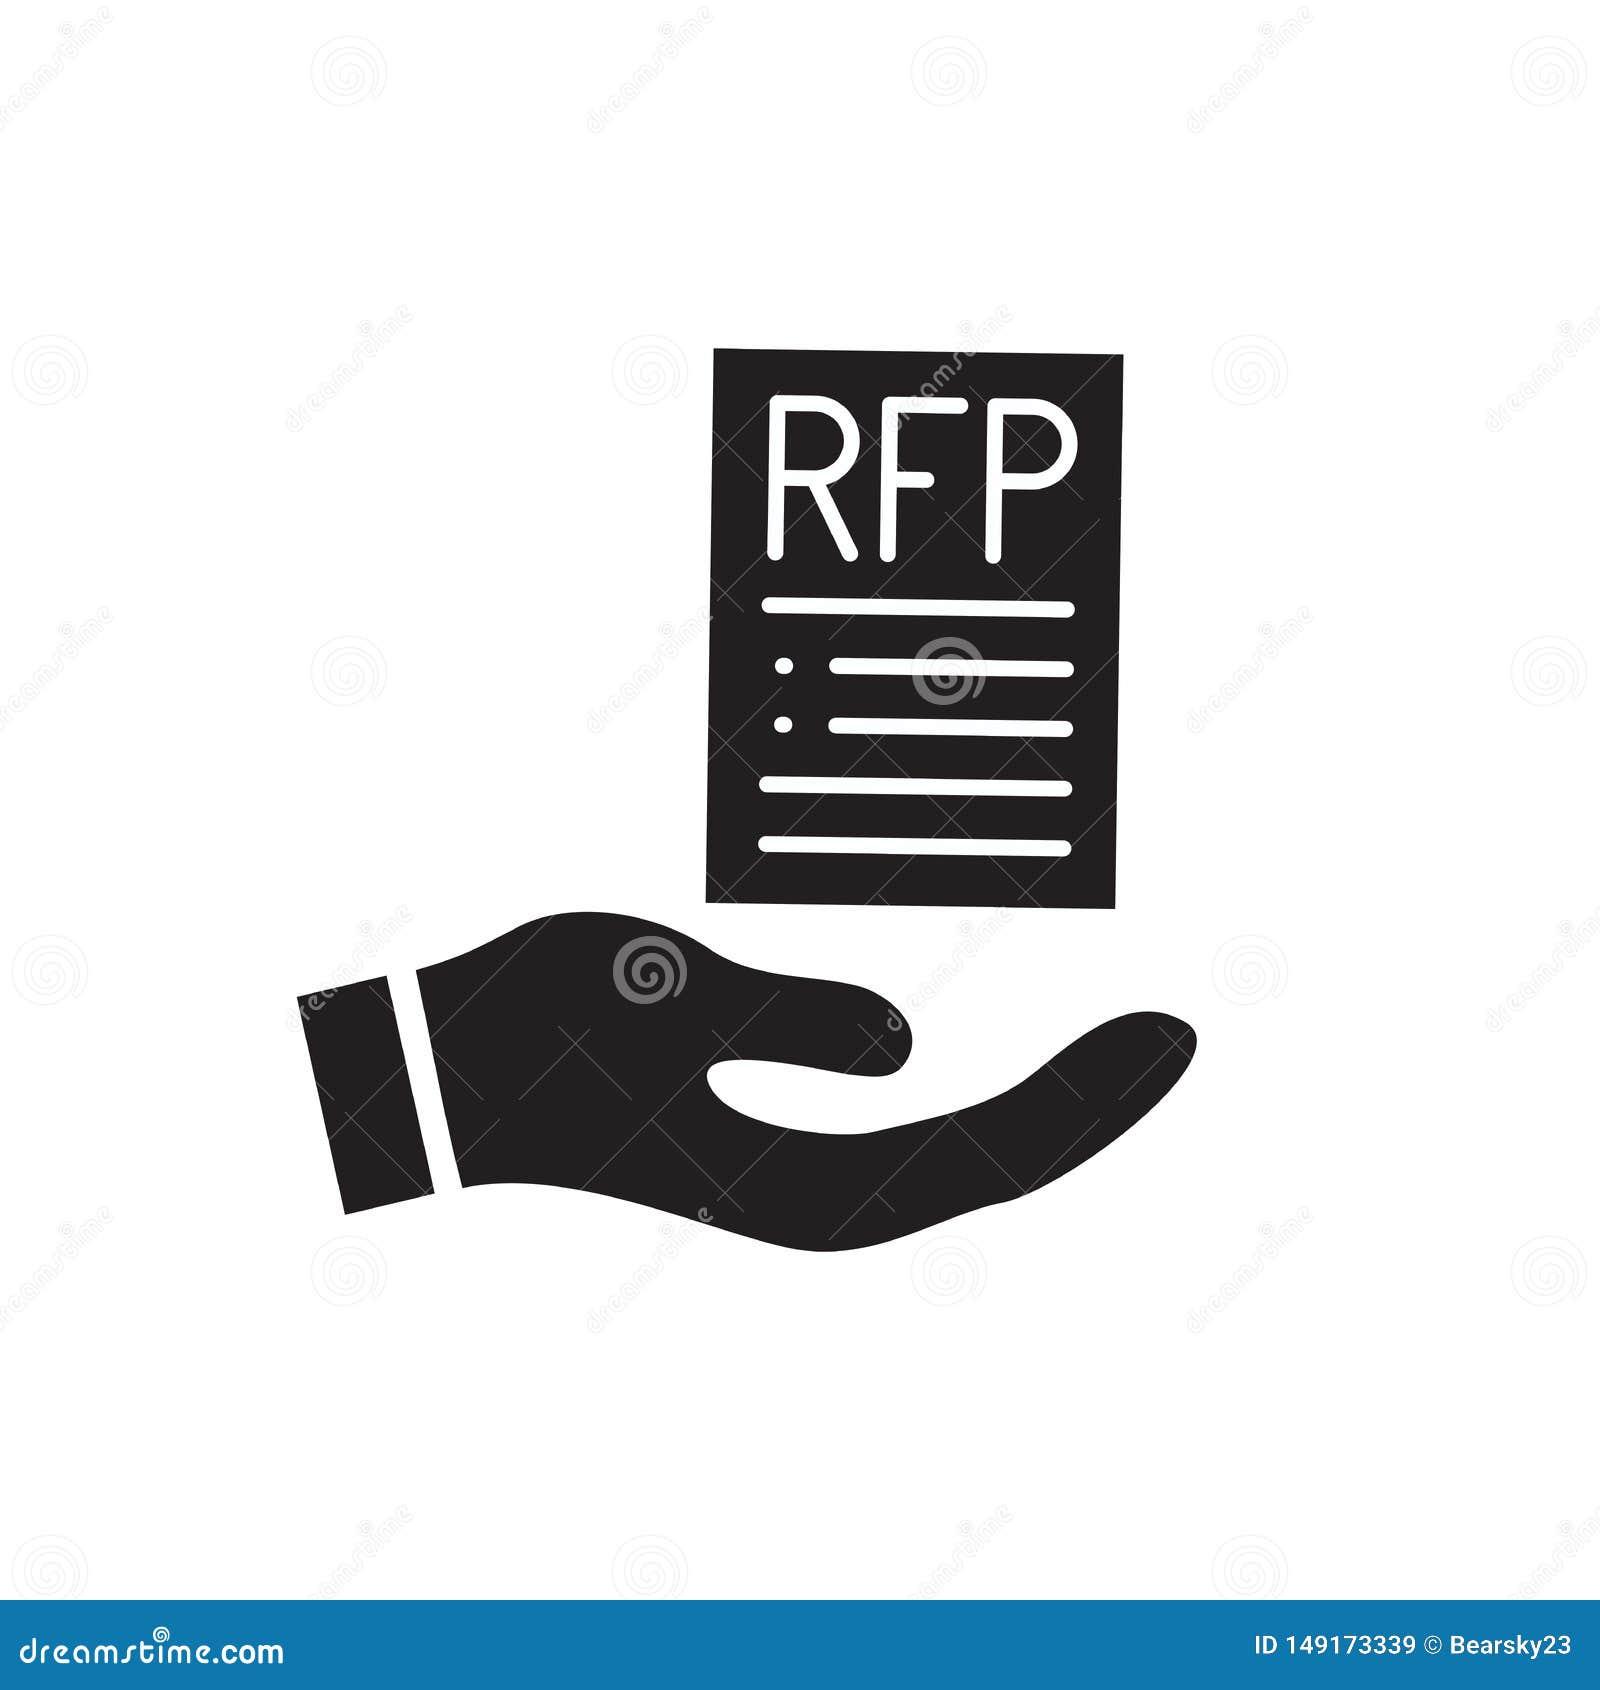 ?cone do RFP - conceito ou ideia do pedido de propostas